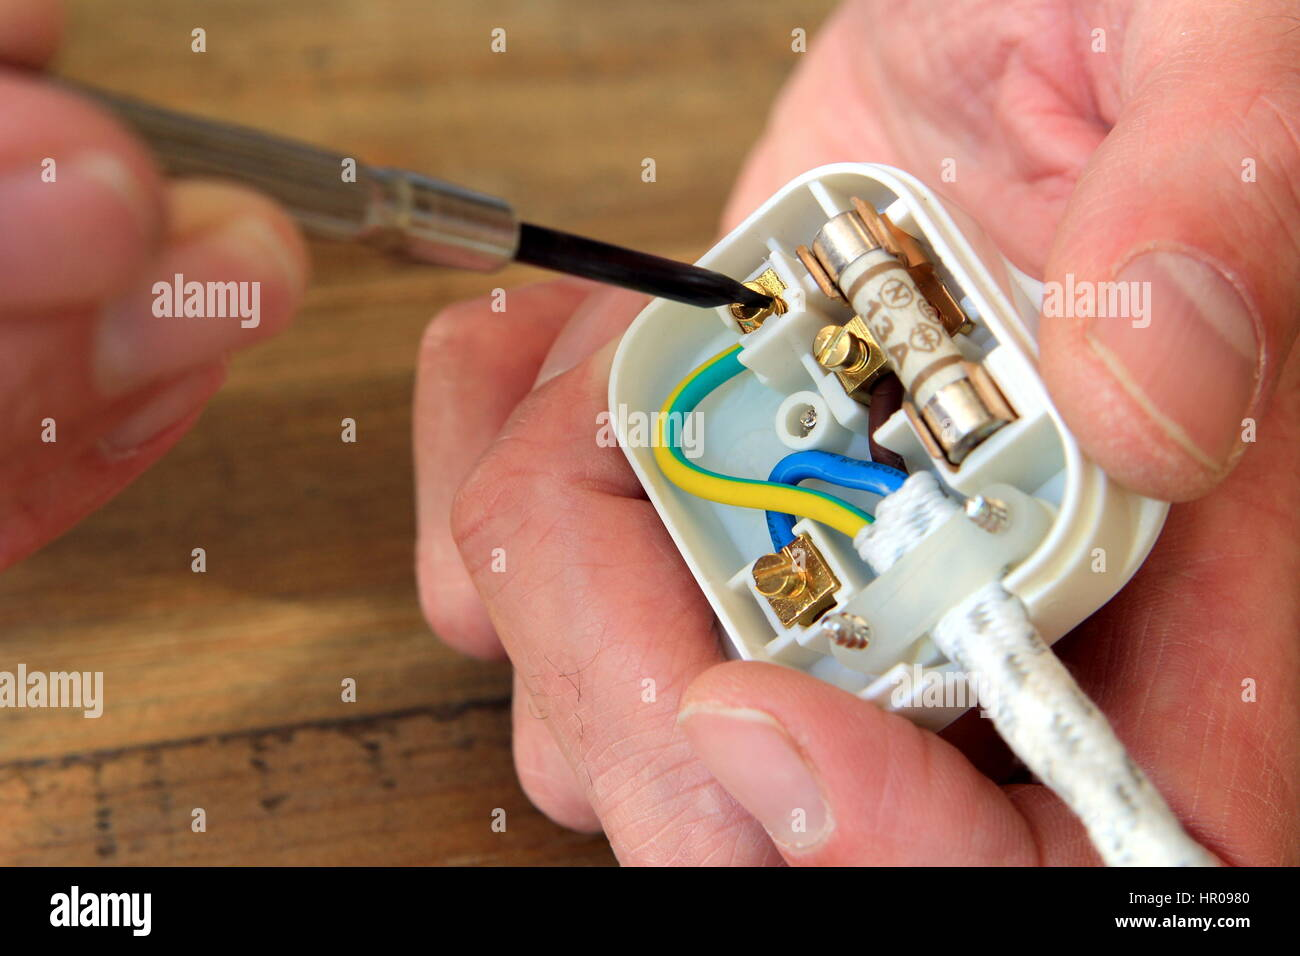 Rewiring Stockfotos & Rewiring Bilder - Alamy